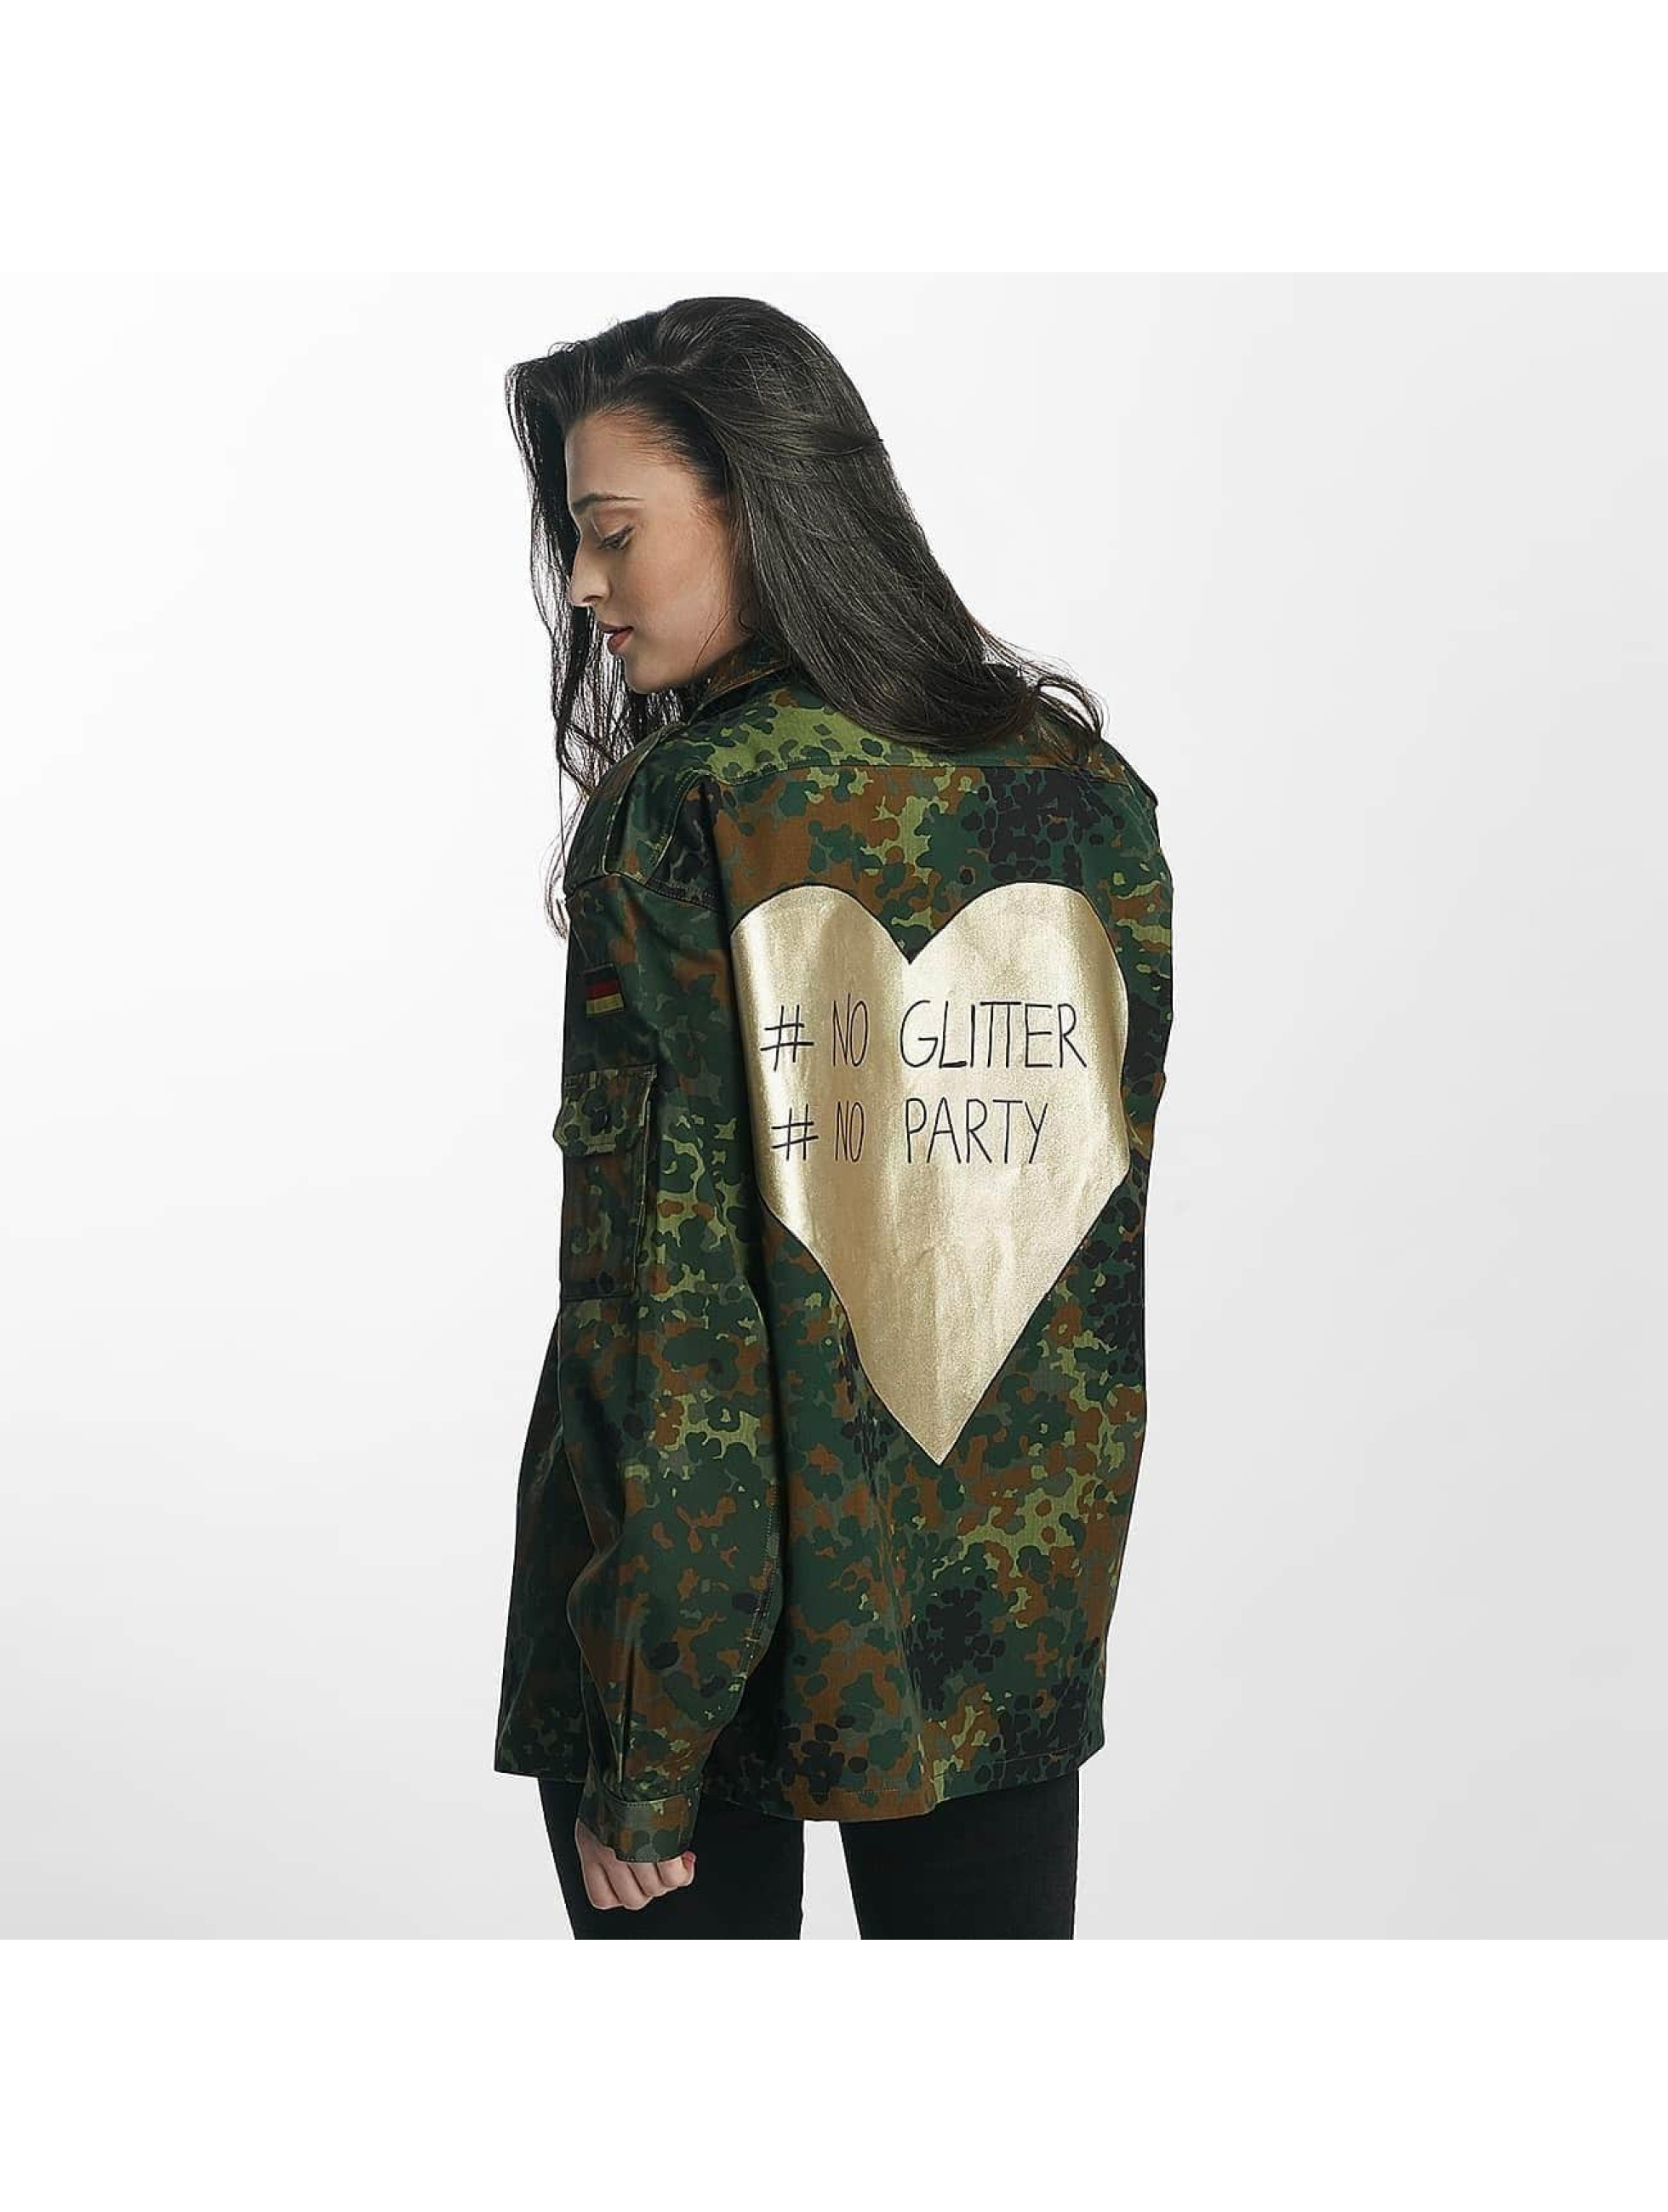 Soniush Frauen Übergangsjacke No Glitter in camouflage